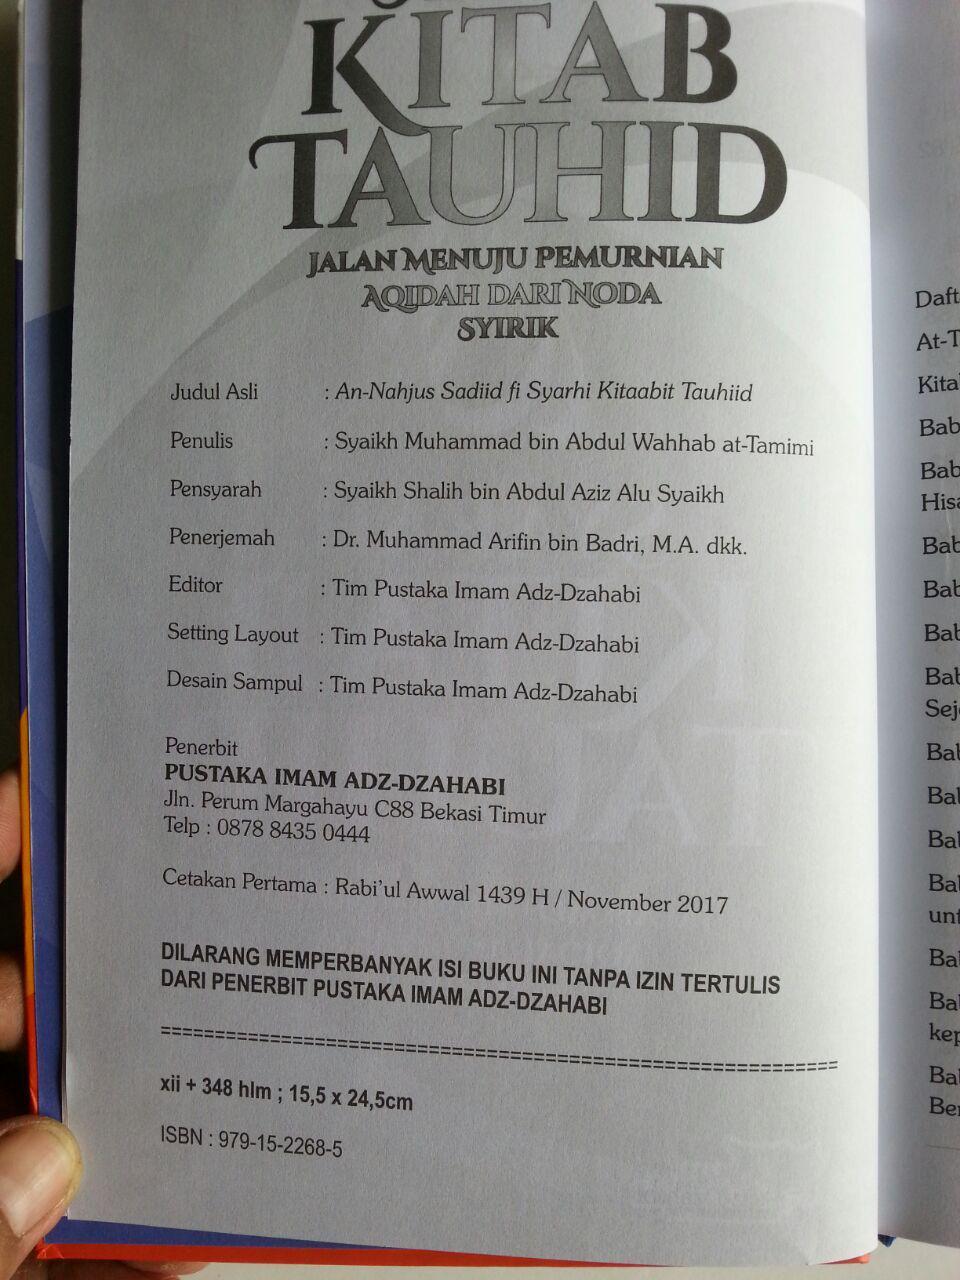 Buku Syarah Kitab Tauhid Jalan Menuju Permurnian Aqidah isi